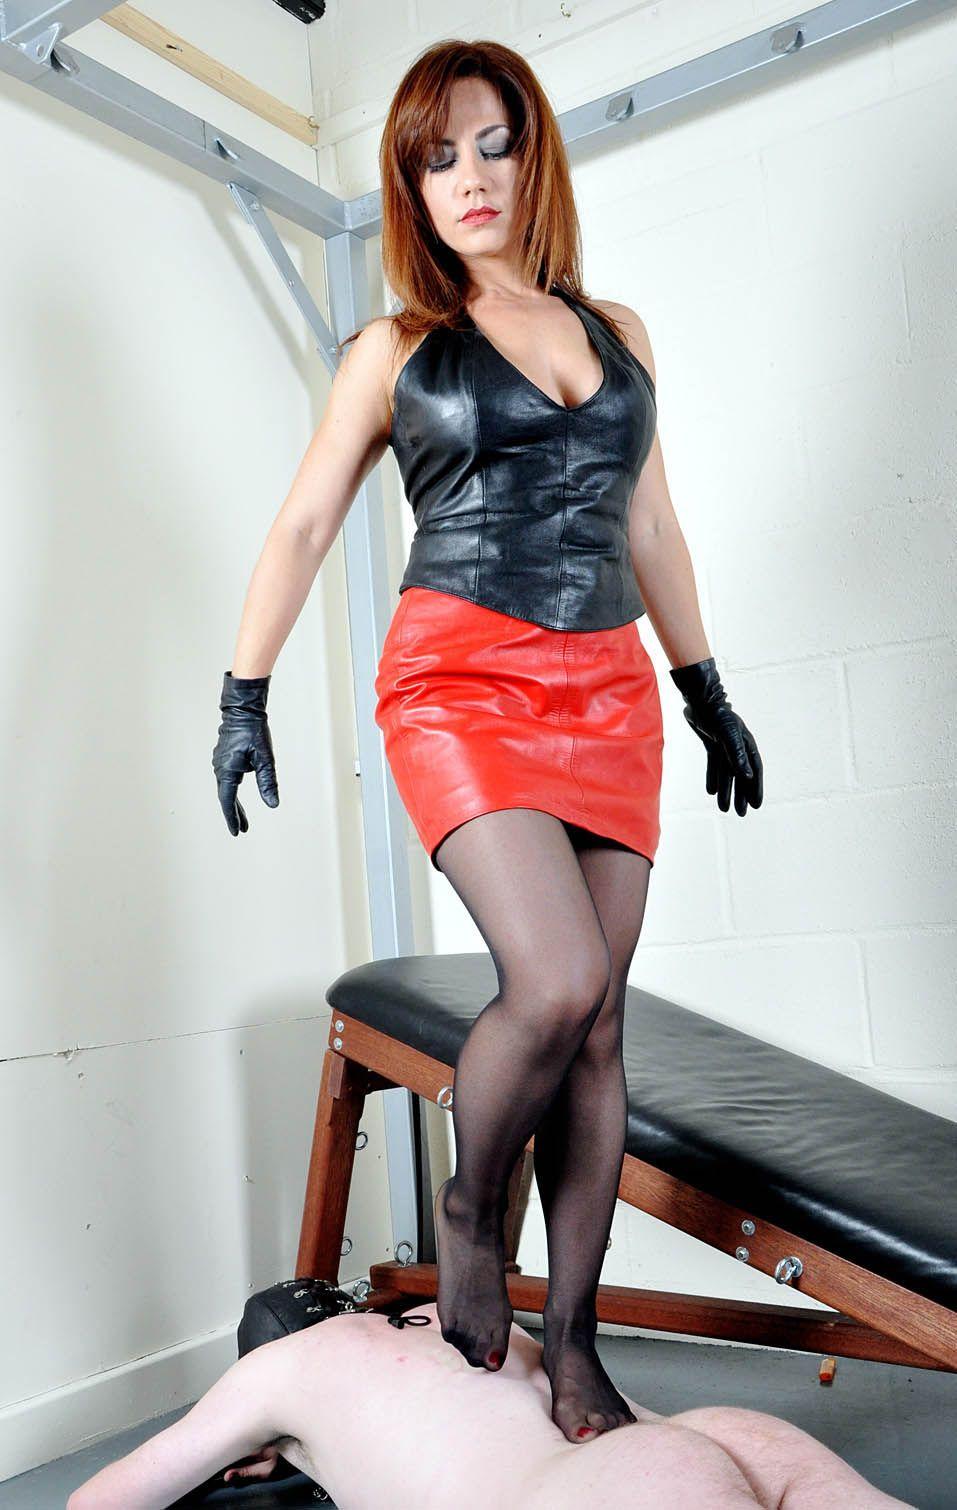 Redhead dominatrix in leather Porn best pics free.